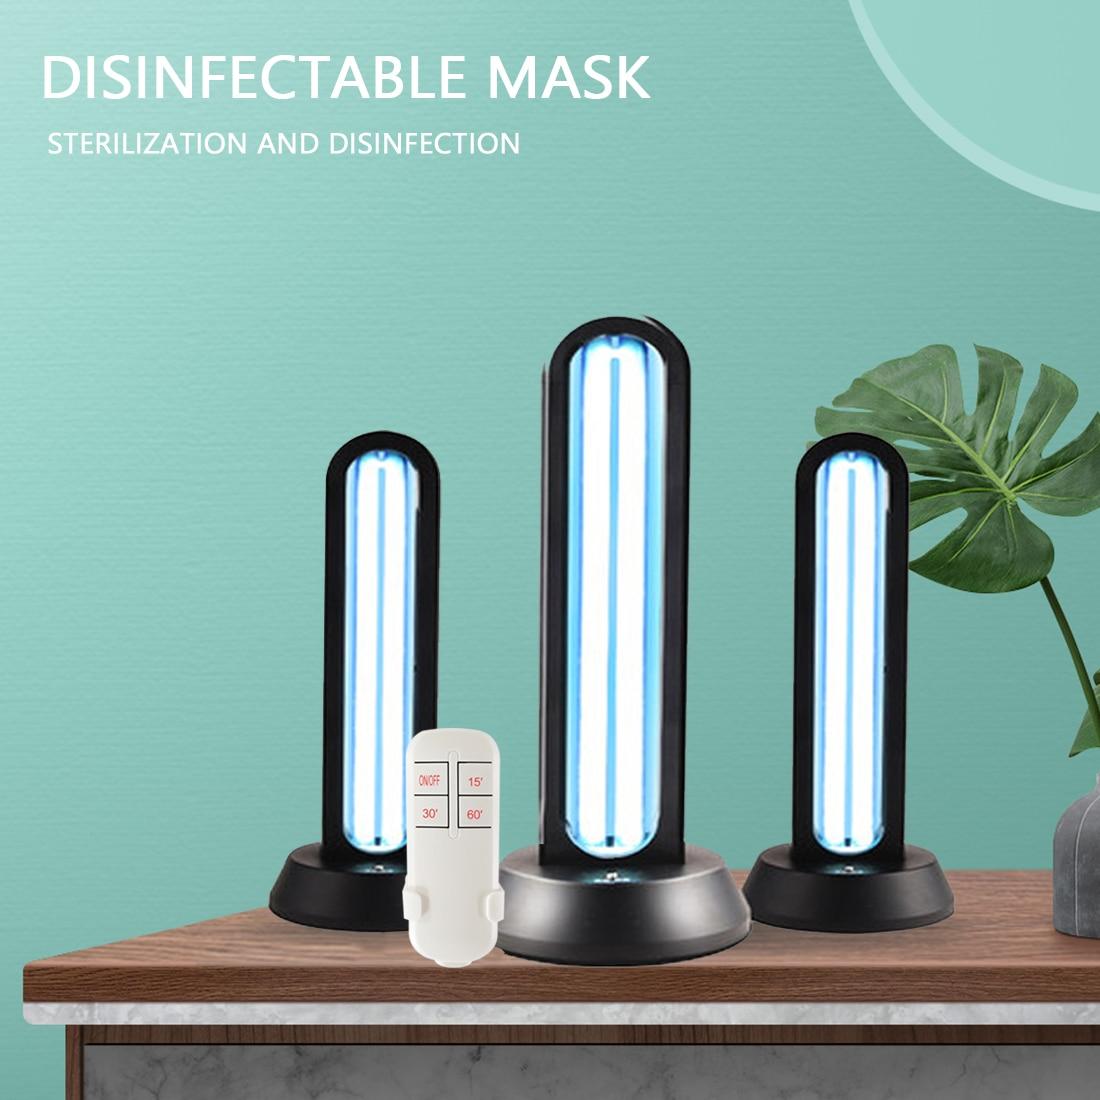 110V UV Ozone Ultraviolet Lamp EU Plug Quartz Lamp UVC Sterilizer Home Kill Mite Germicidal Light Bulb Disinfection Air Clean недорого